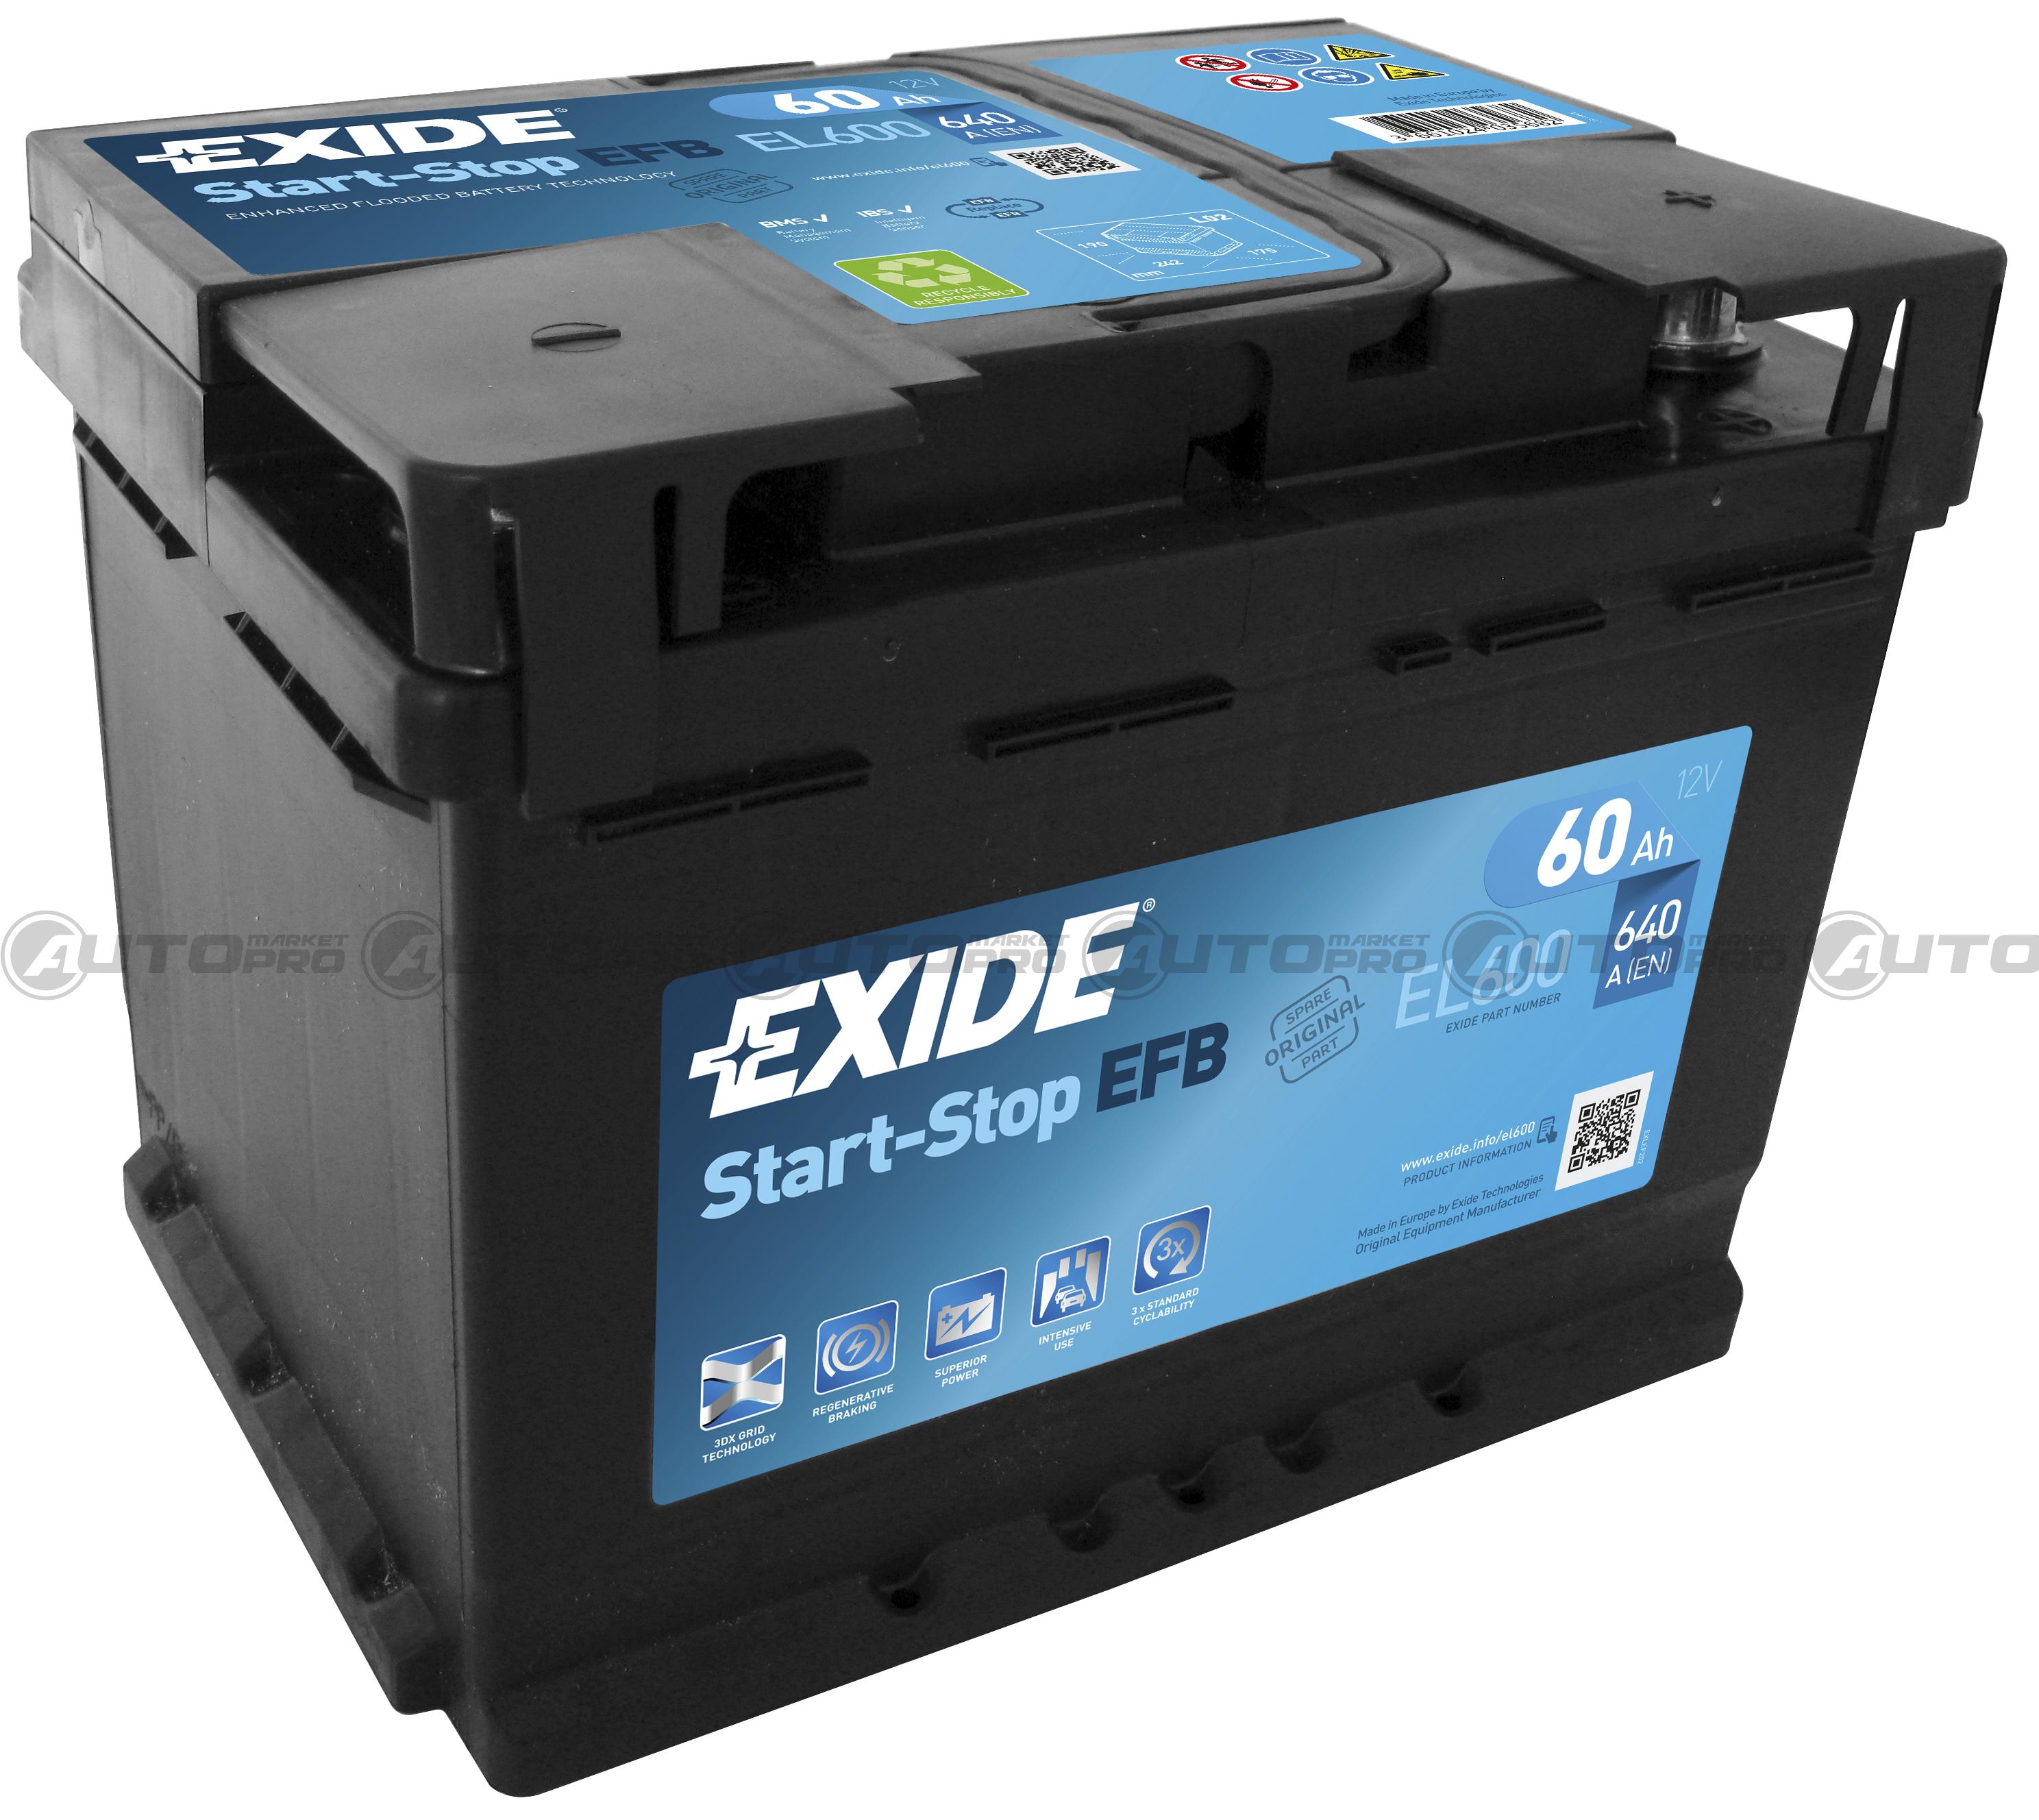 exide start stop efb el600 60 ampere 640 en ricambi auto furgoni e moto. Black Bedroom Furniture Sets. Home Design Ideas